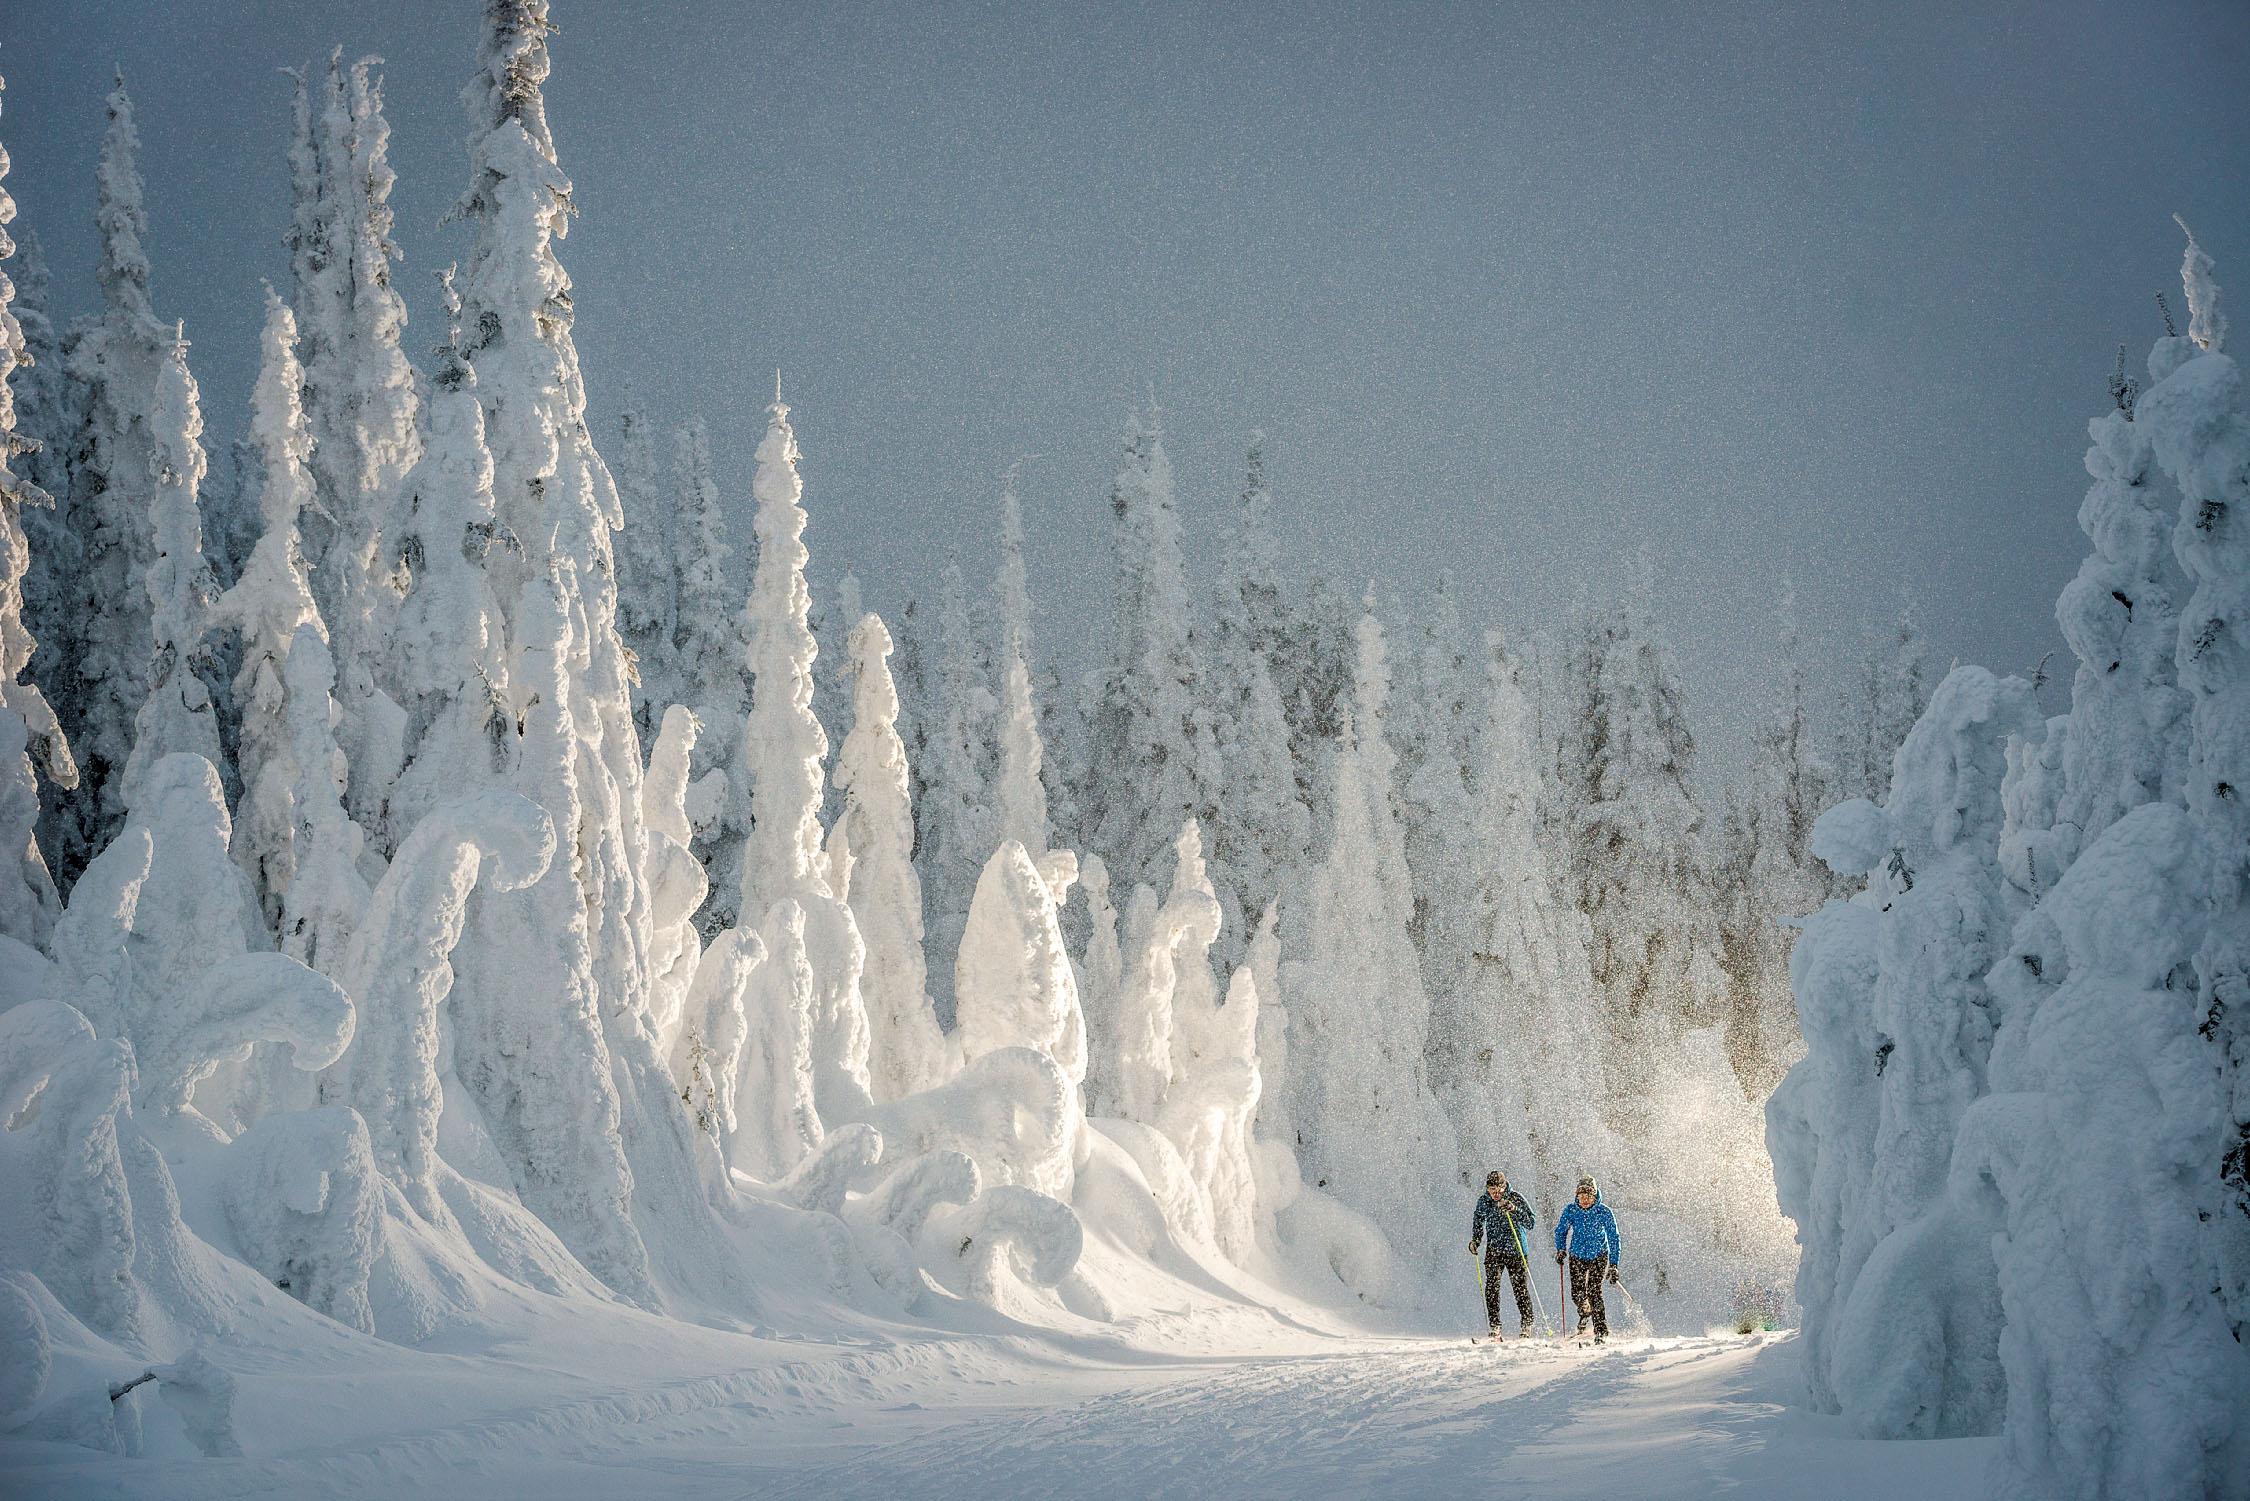 Cross-country skiing at SilverStar Mountain Resort